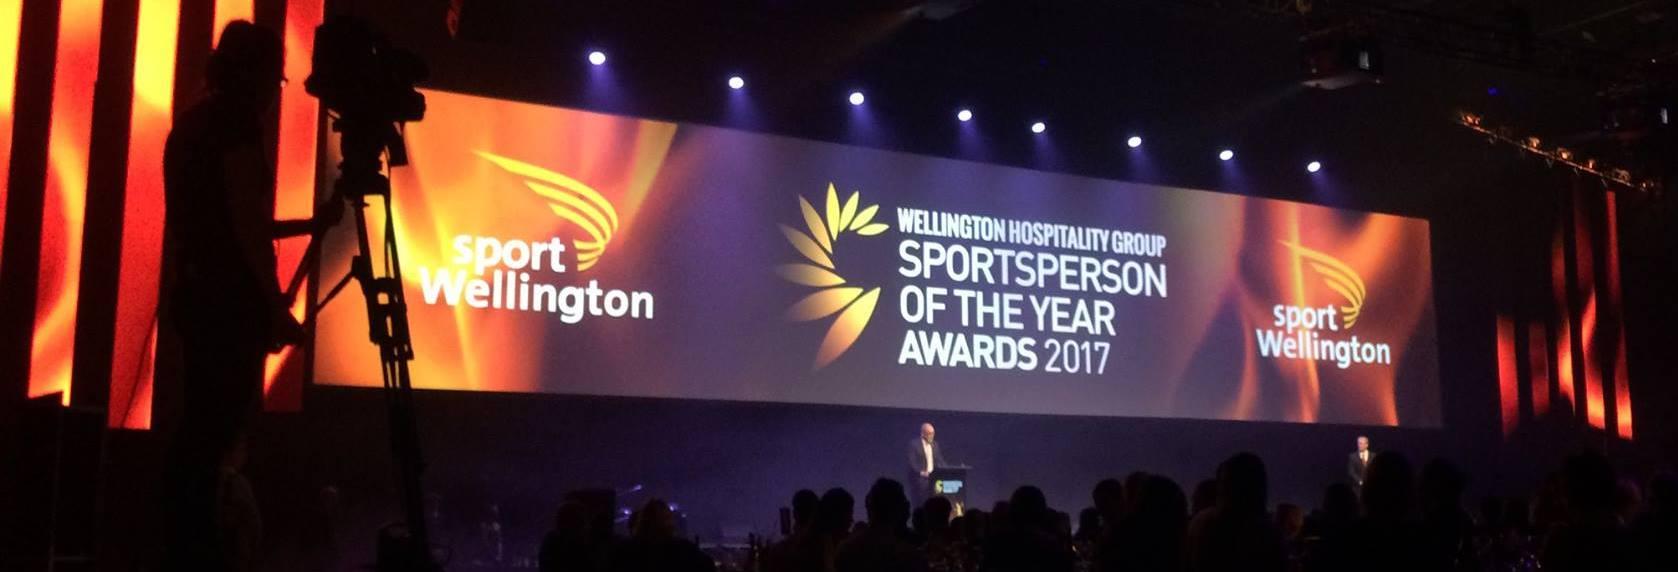 Copy of Sports Awards 1.jpg